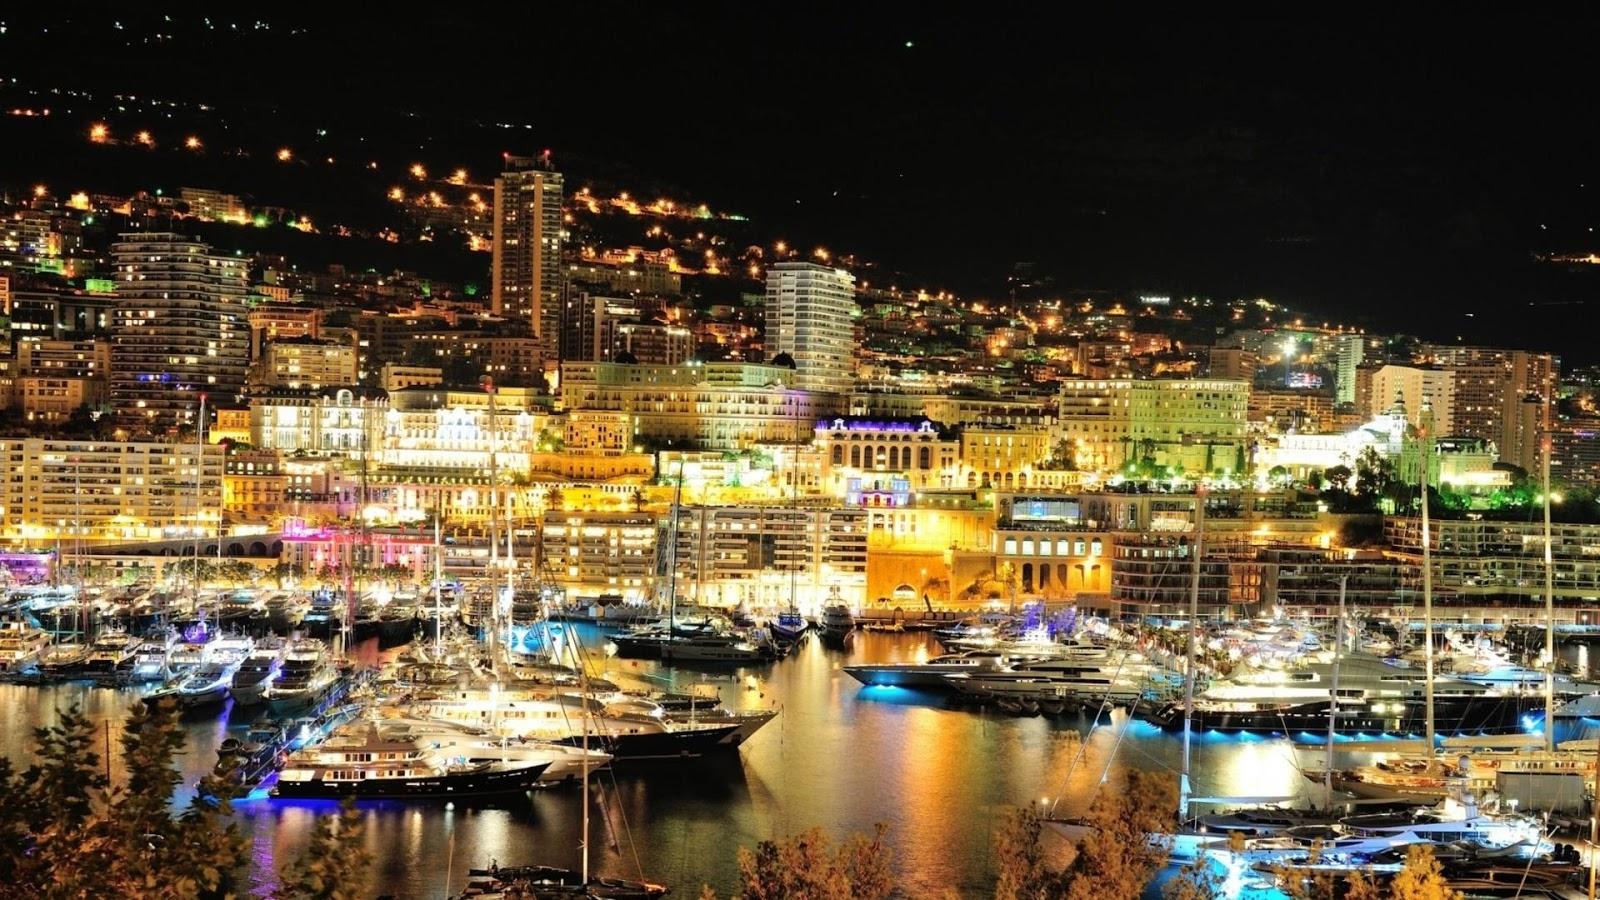 St Tropez Live Wallpaper 16 APK Download   Android 1600x900